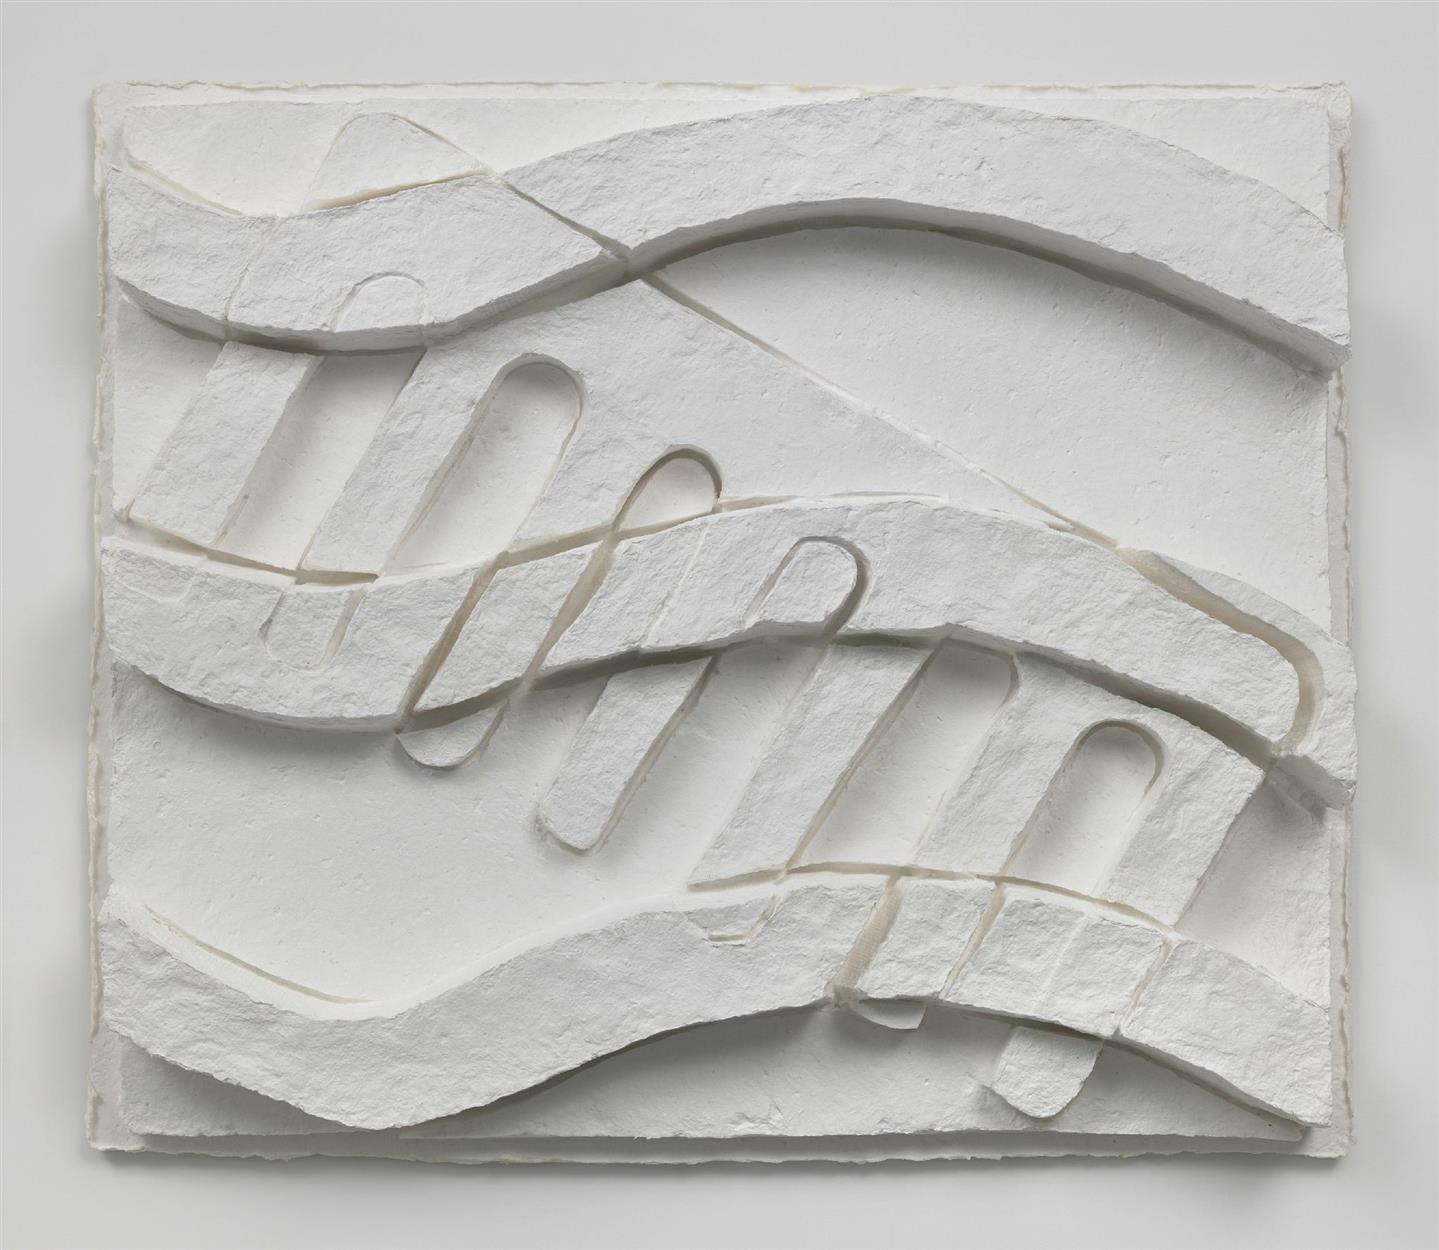 Wyatt Kahn, Untitled, 2016